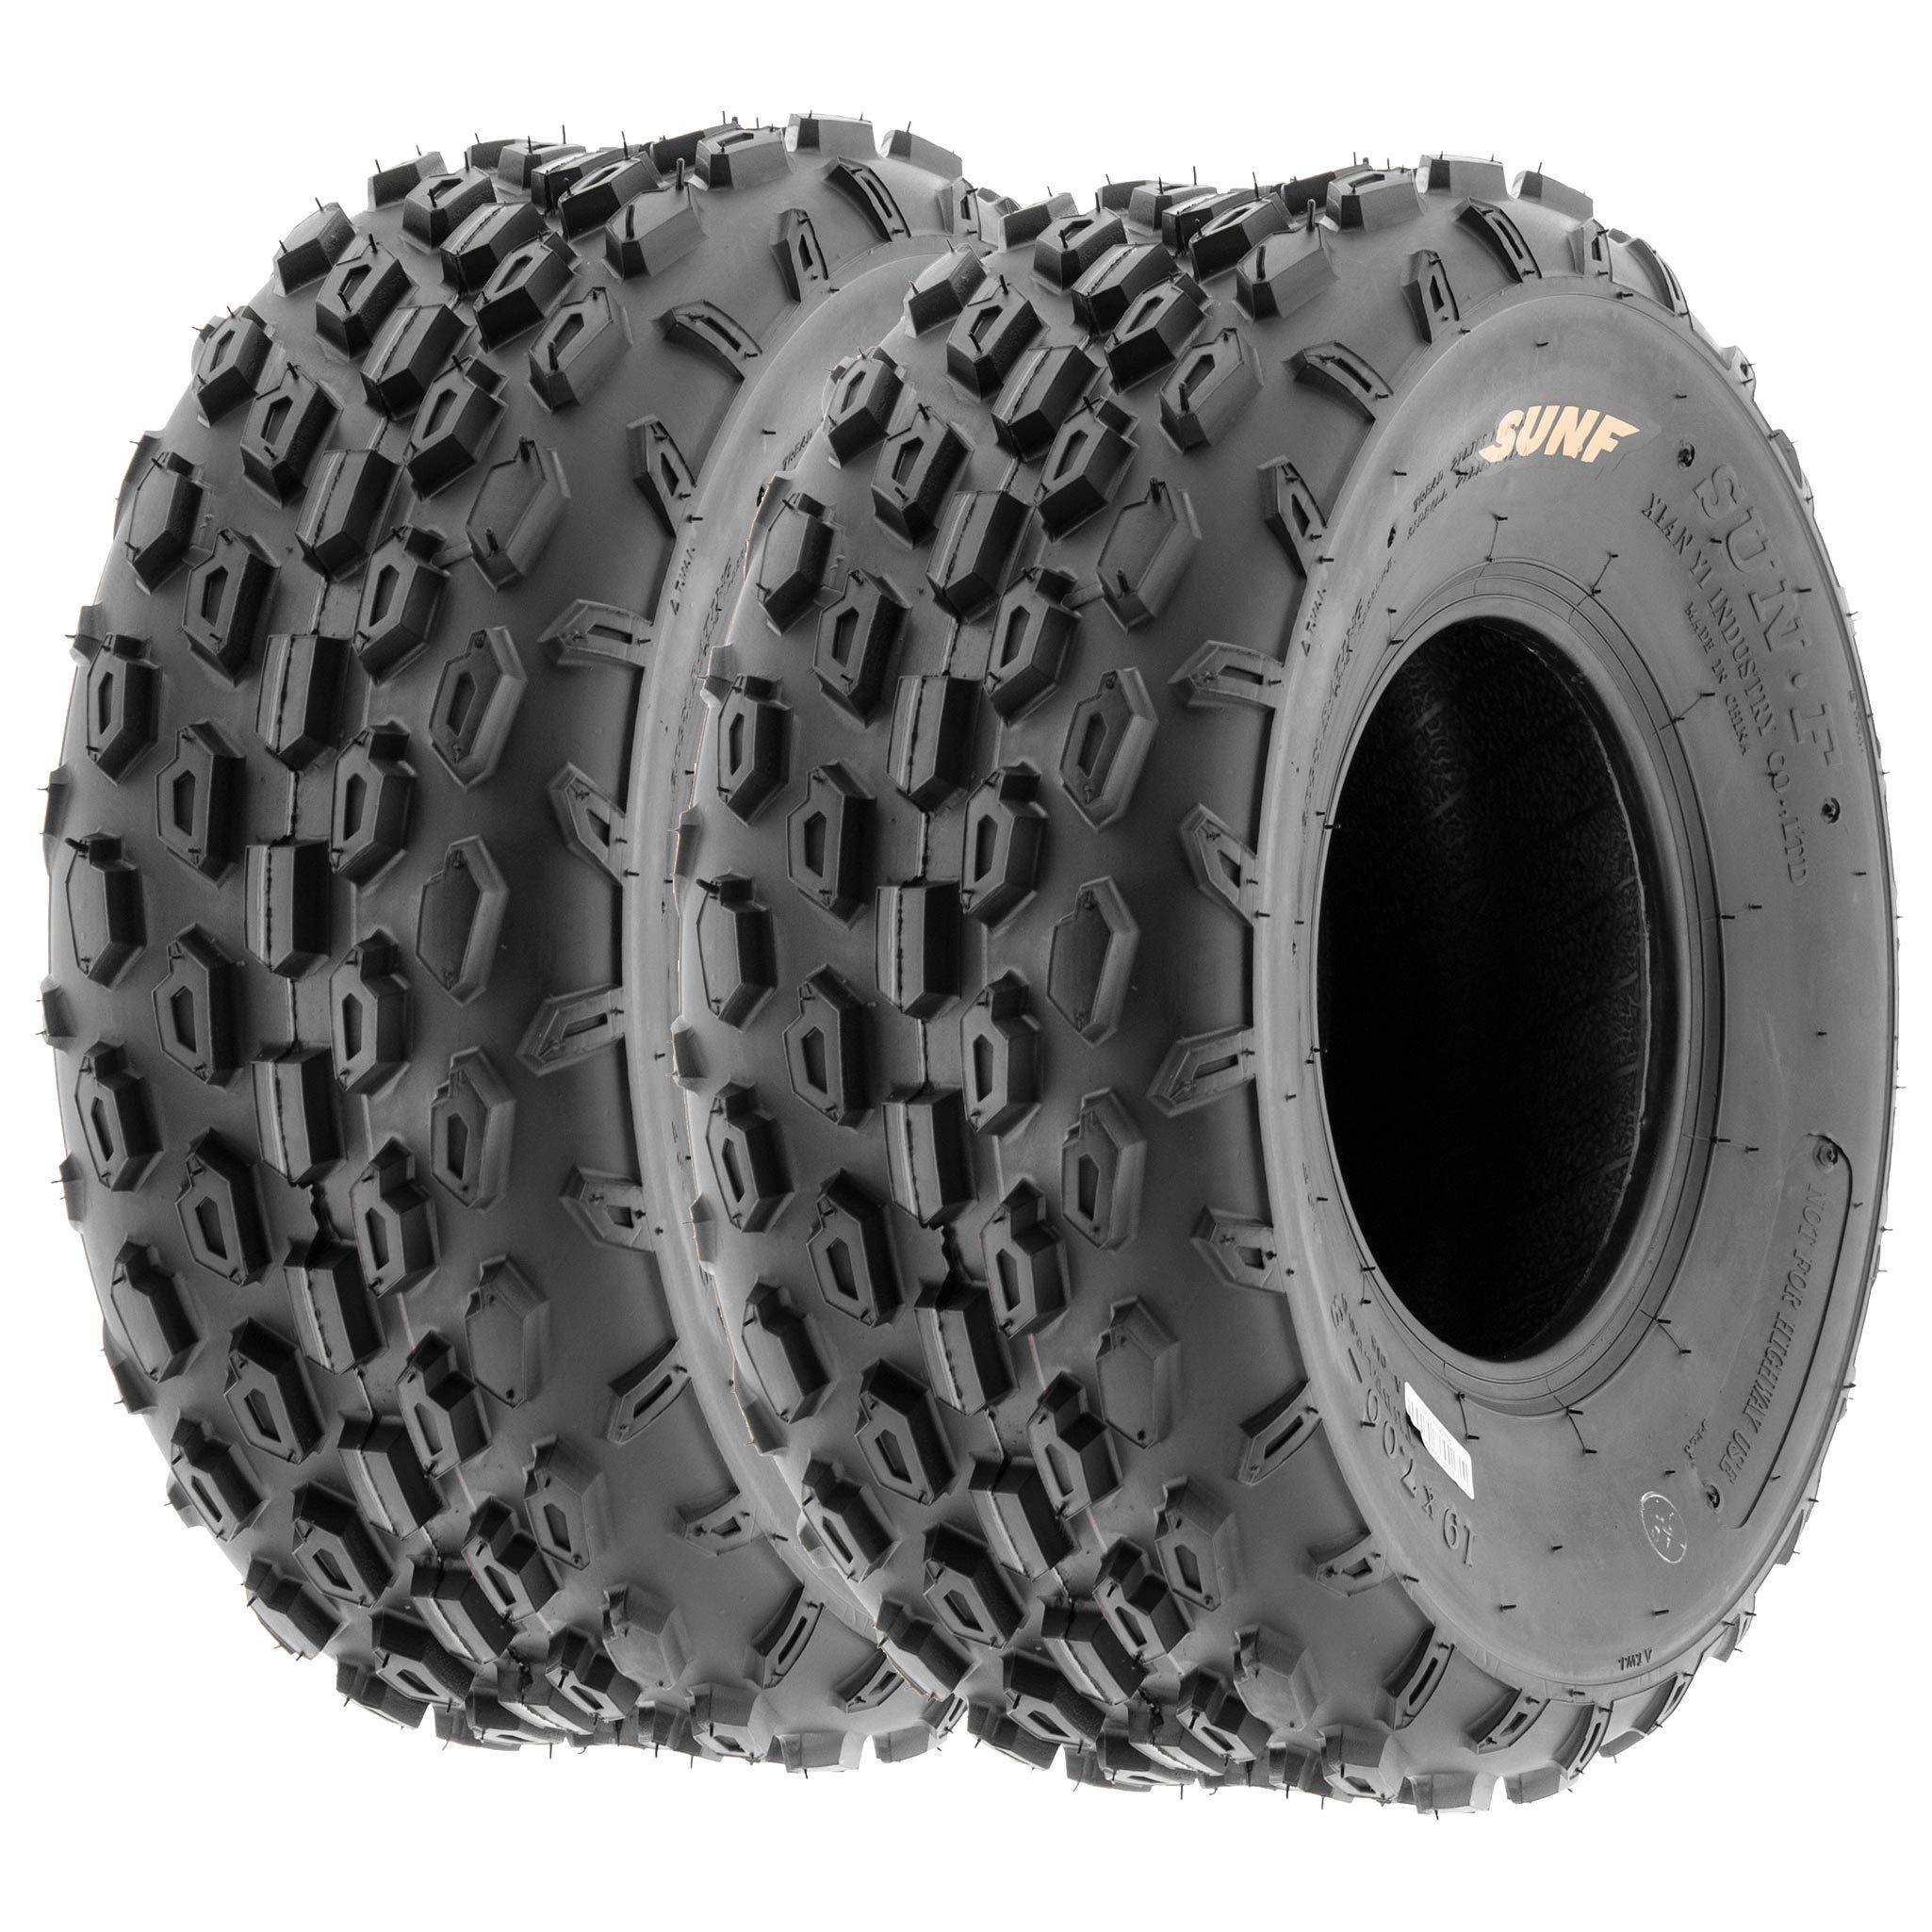 Set of 2 SunF A015 Sport-Racing ATV/UTV Tires 19x7-8, 6-PR by SUNF